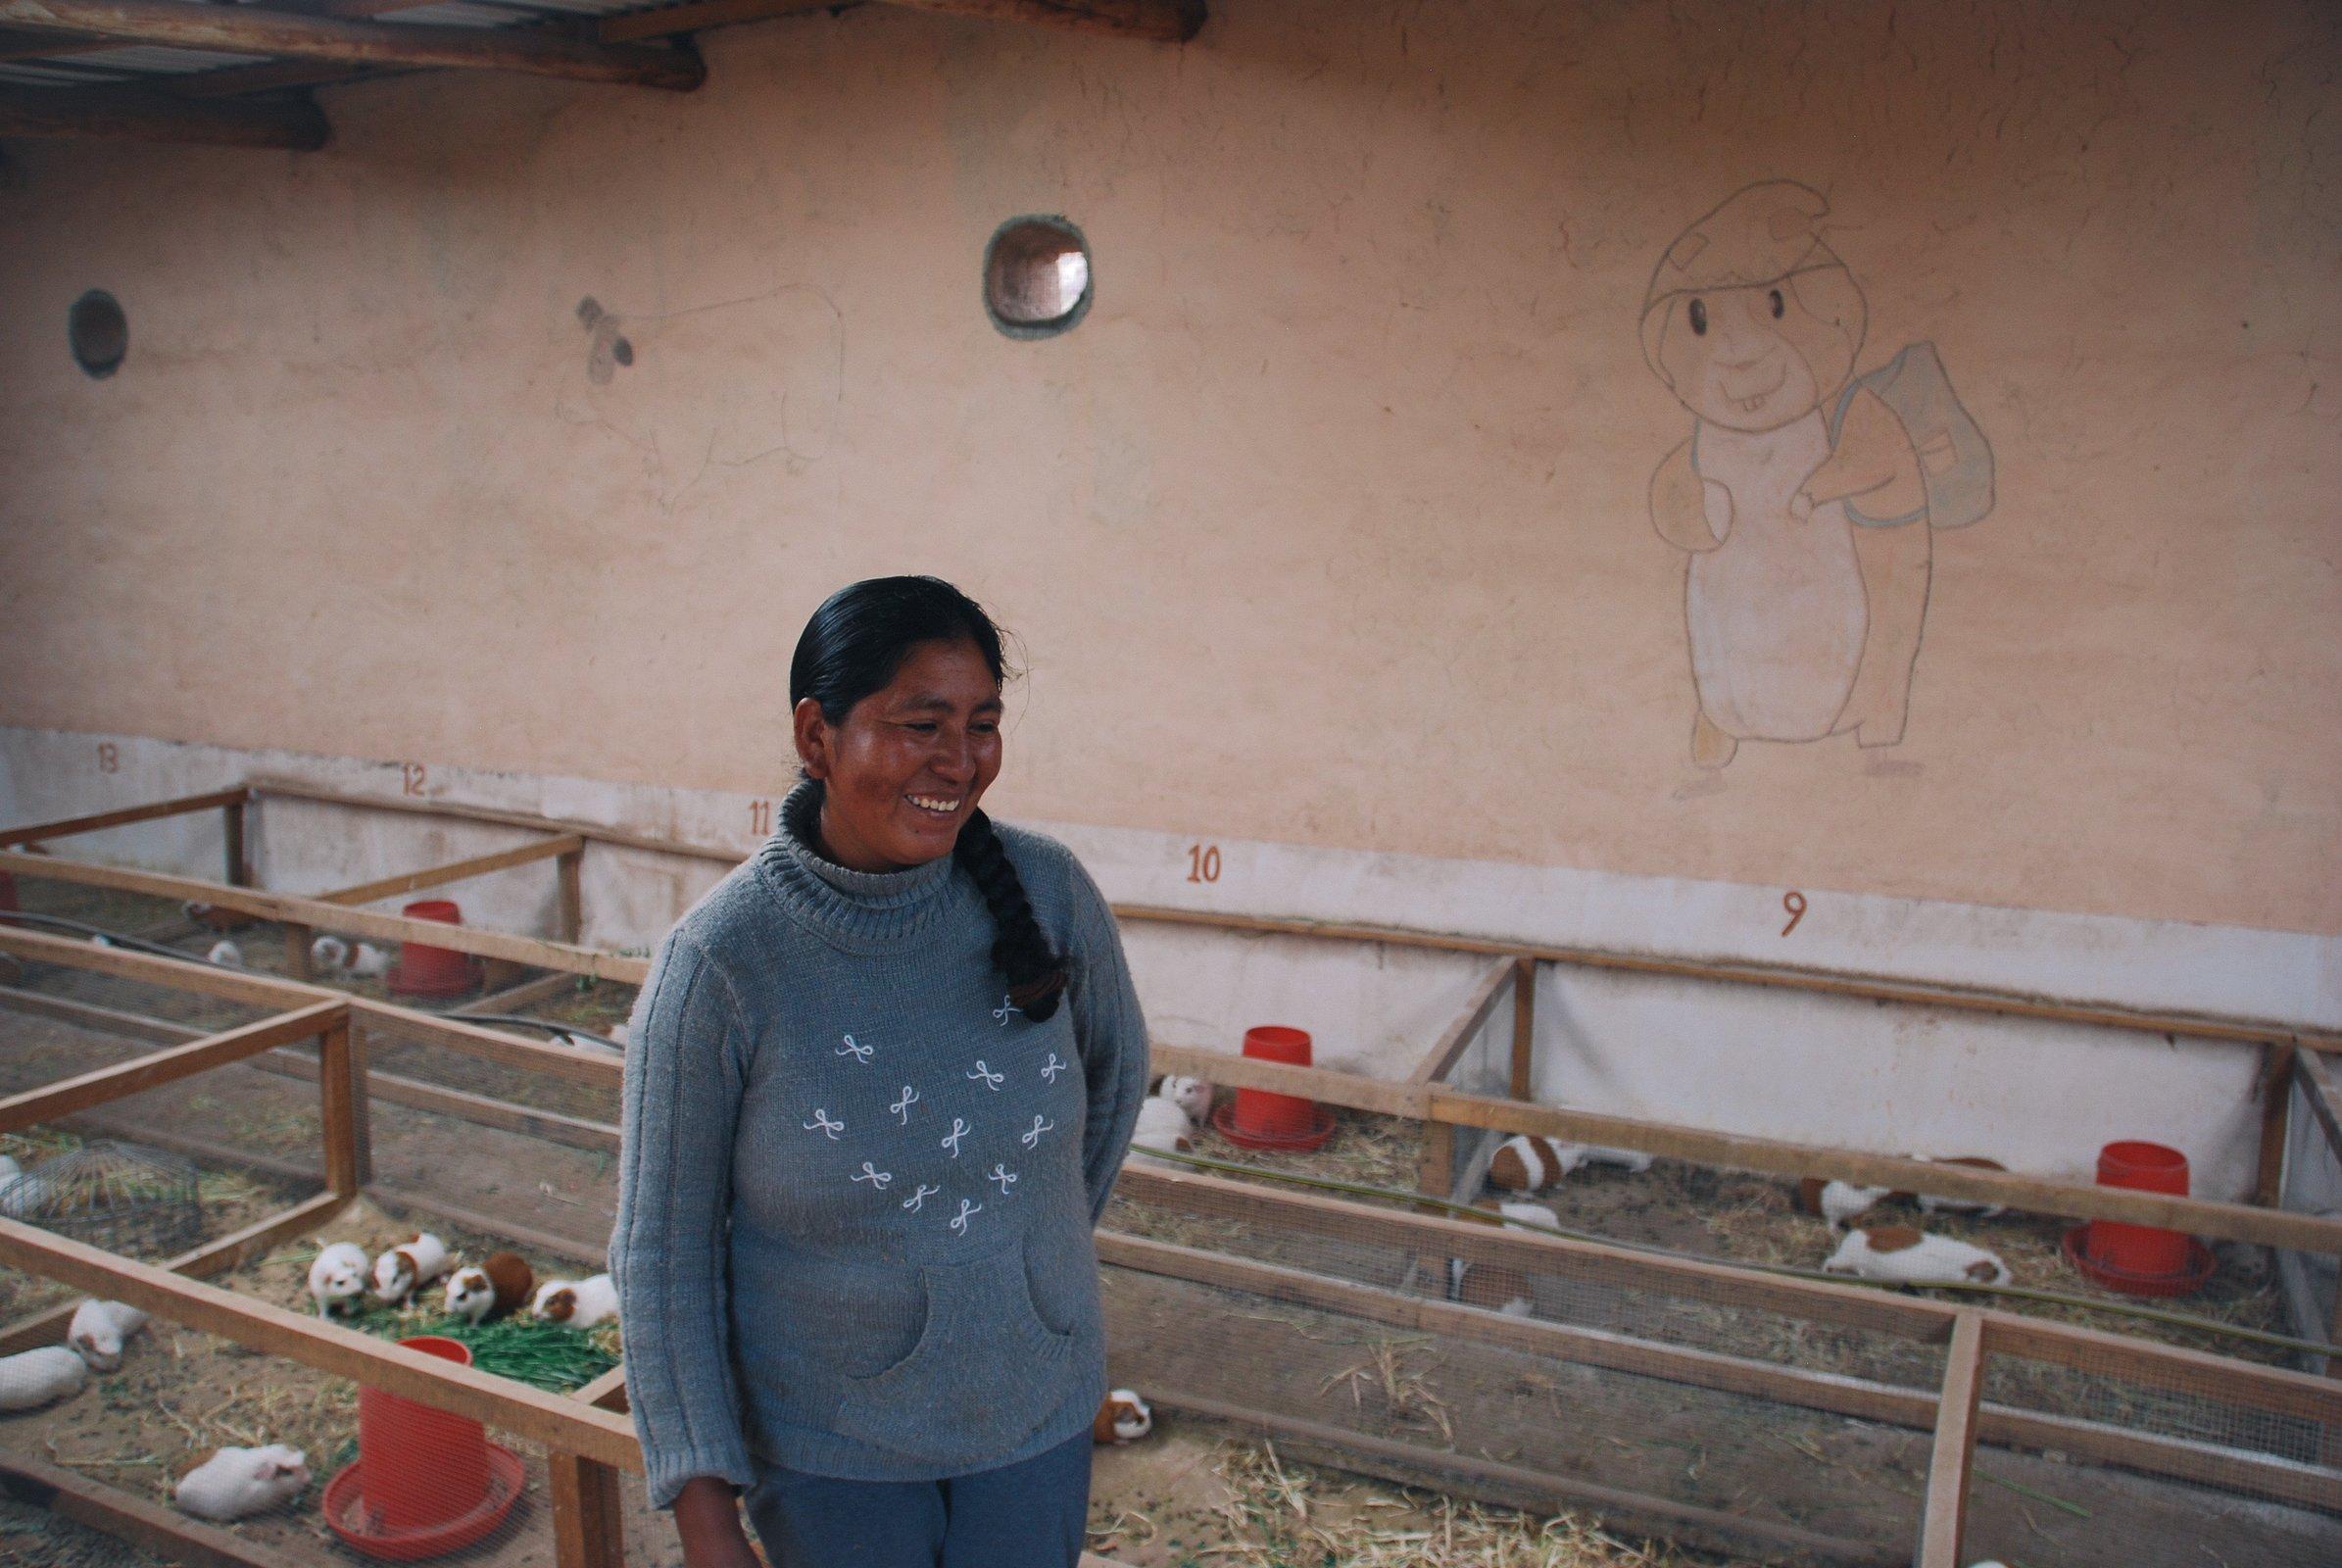 Orgullo quechua 2